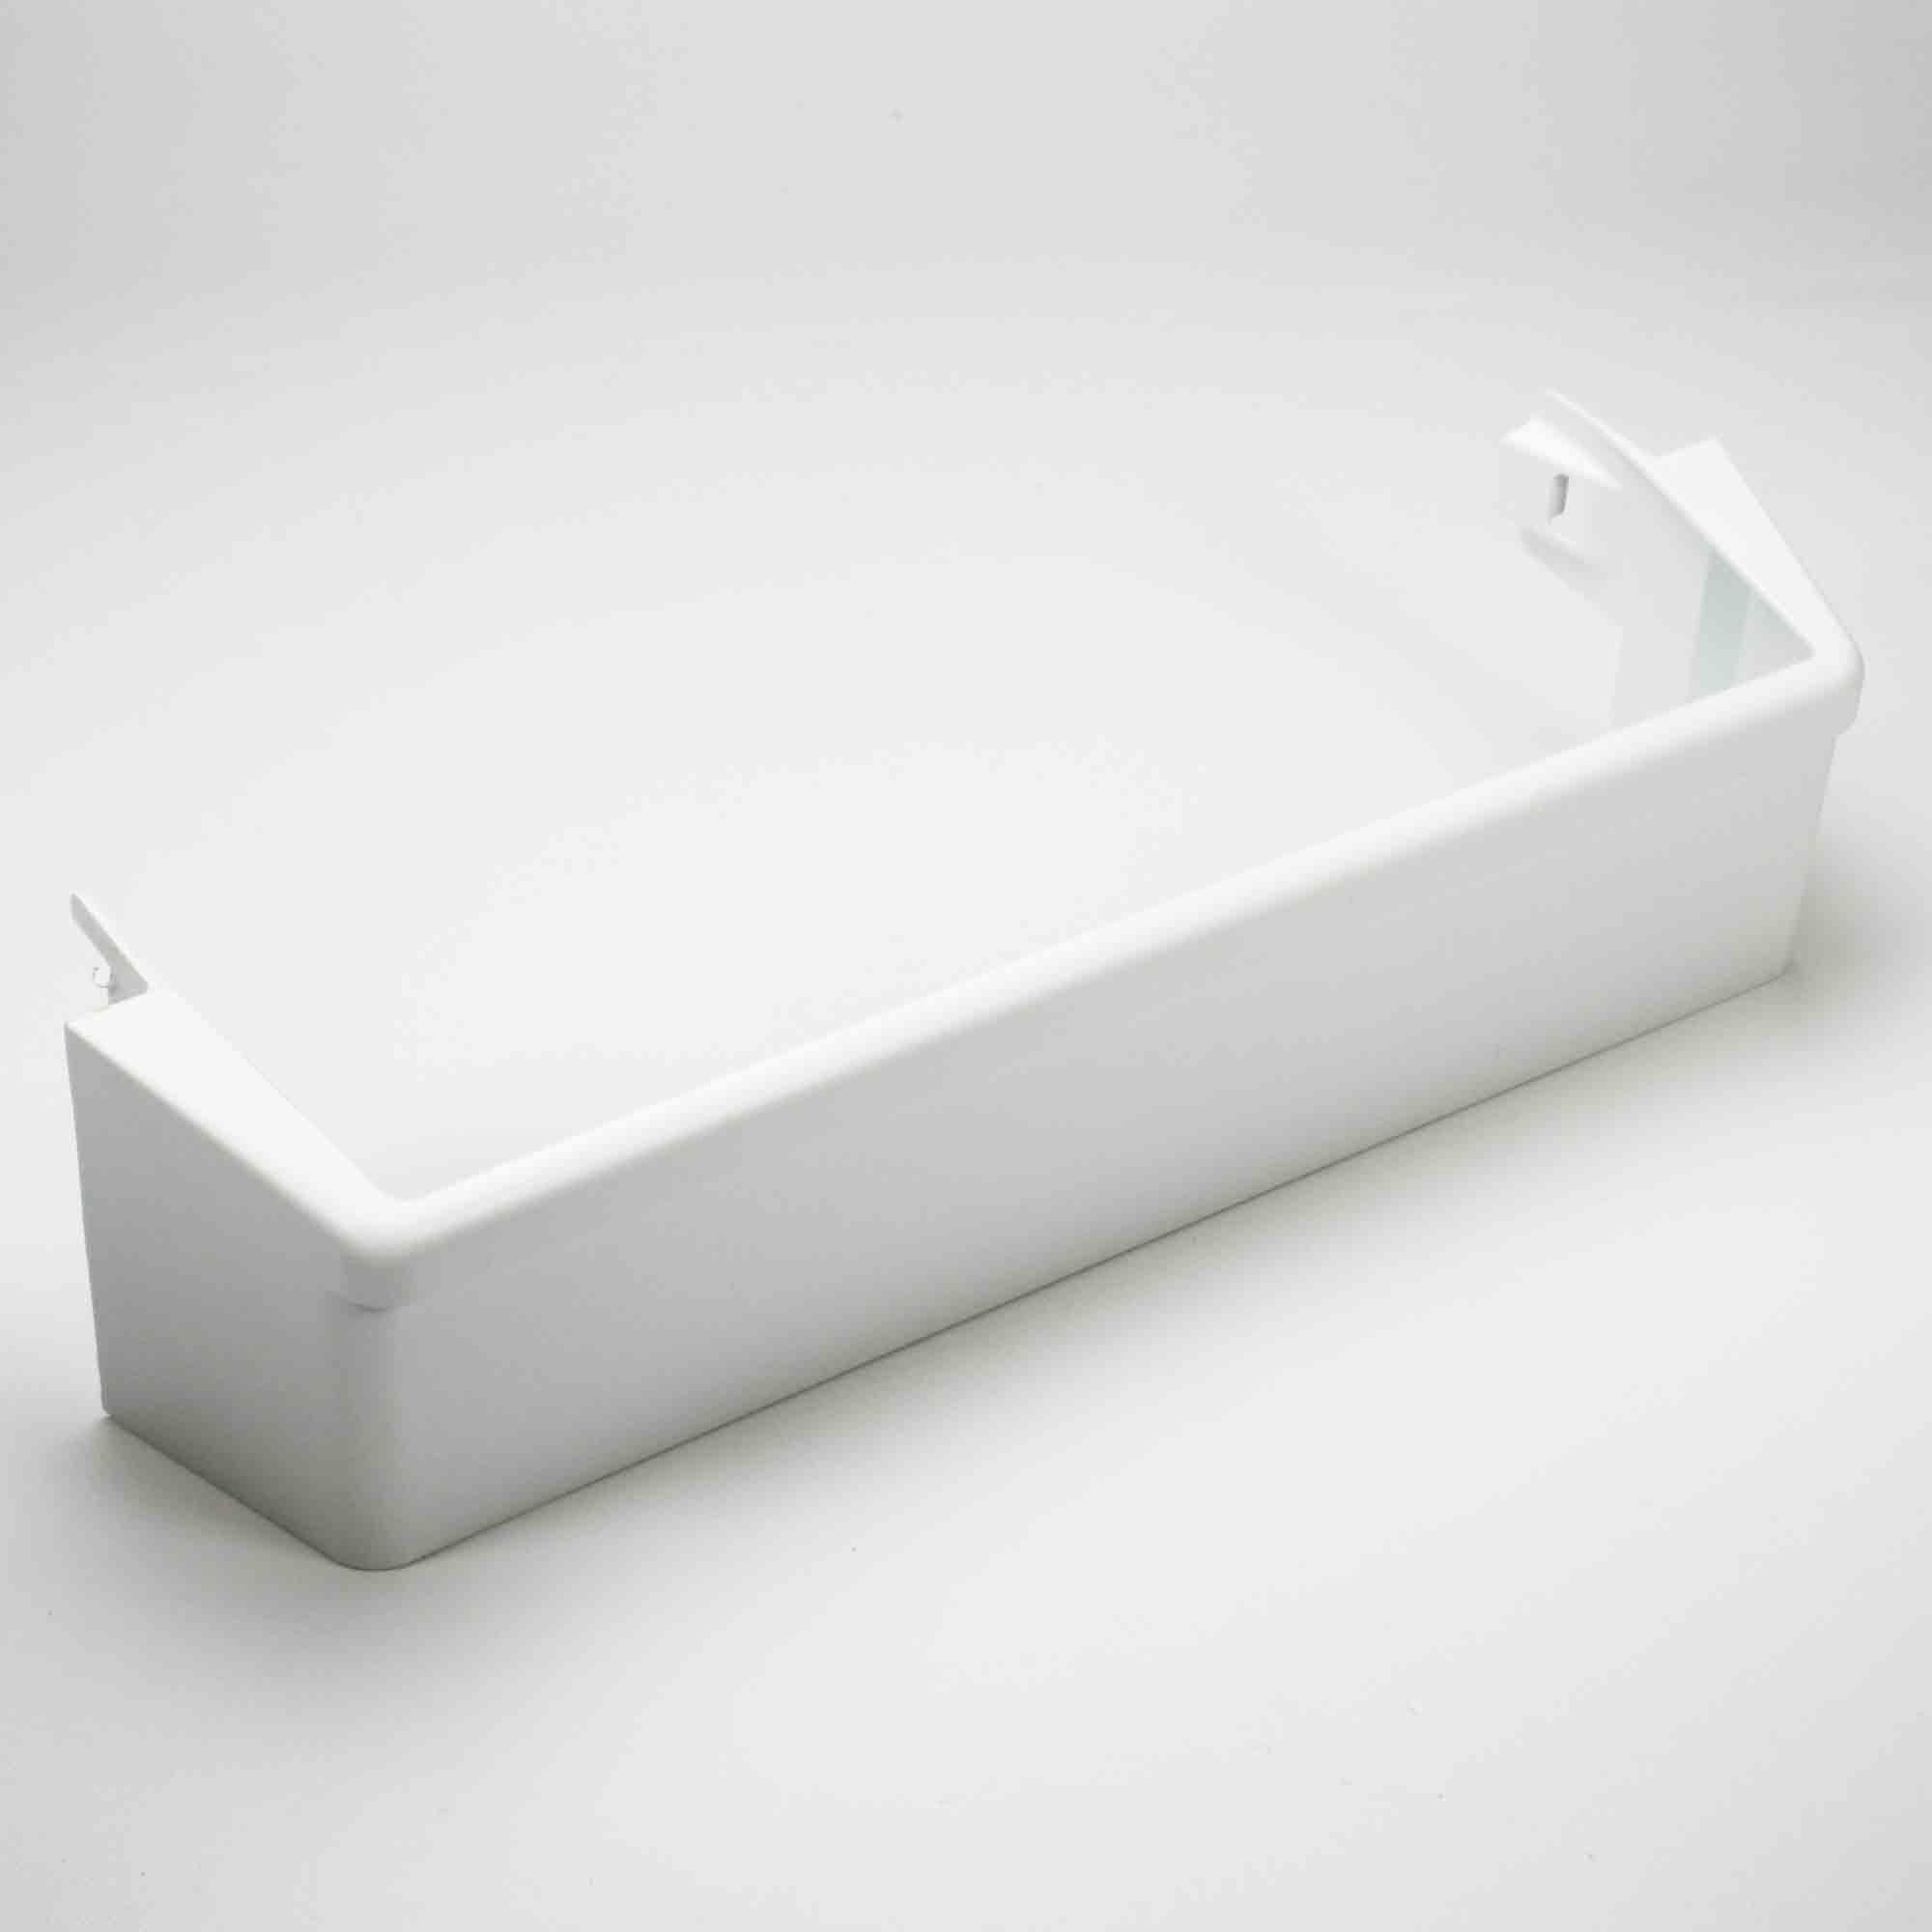 wp2156022 whirlpool refrigerator door shelf bar ebay. Black Bedroom Furniture Sets. Home Design Ideas